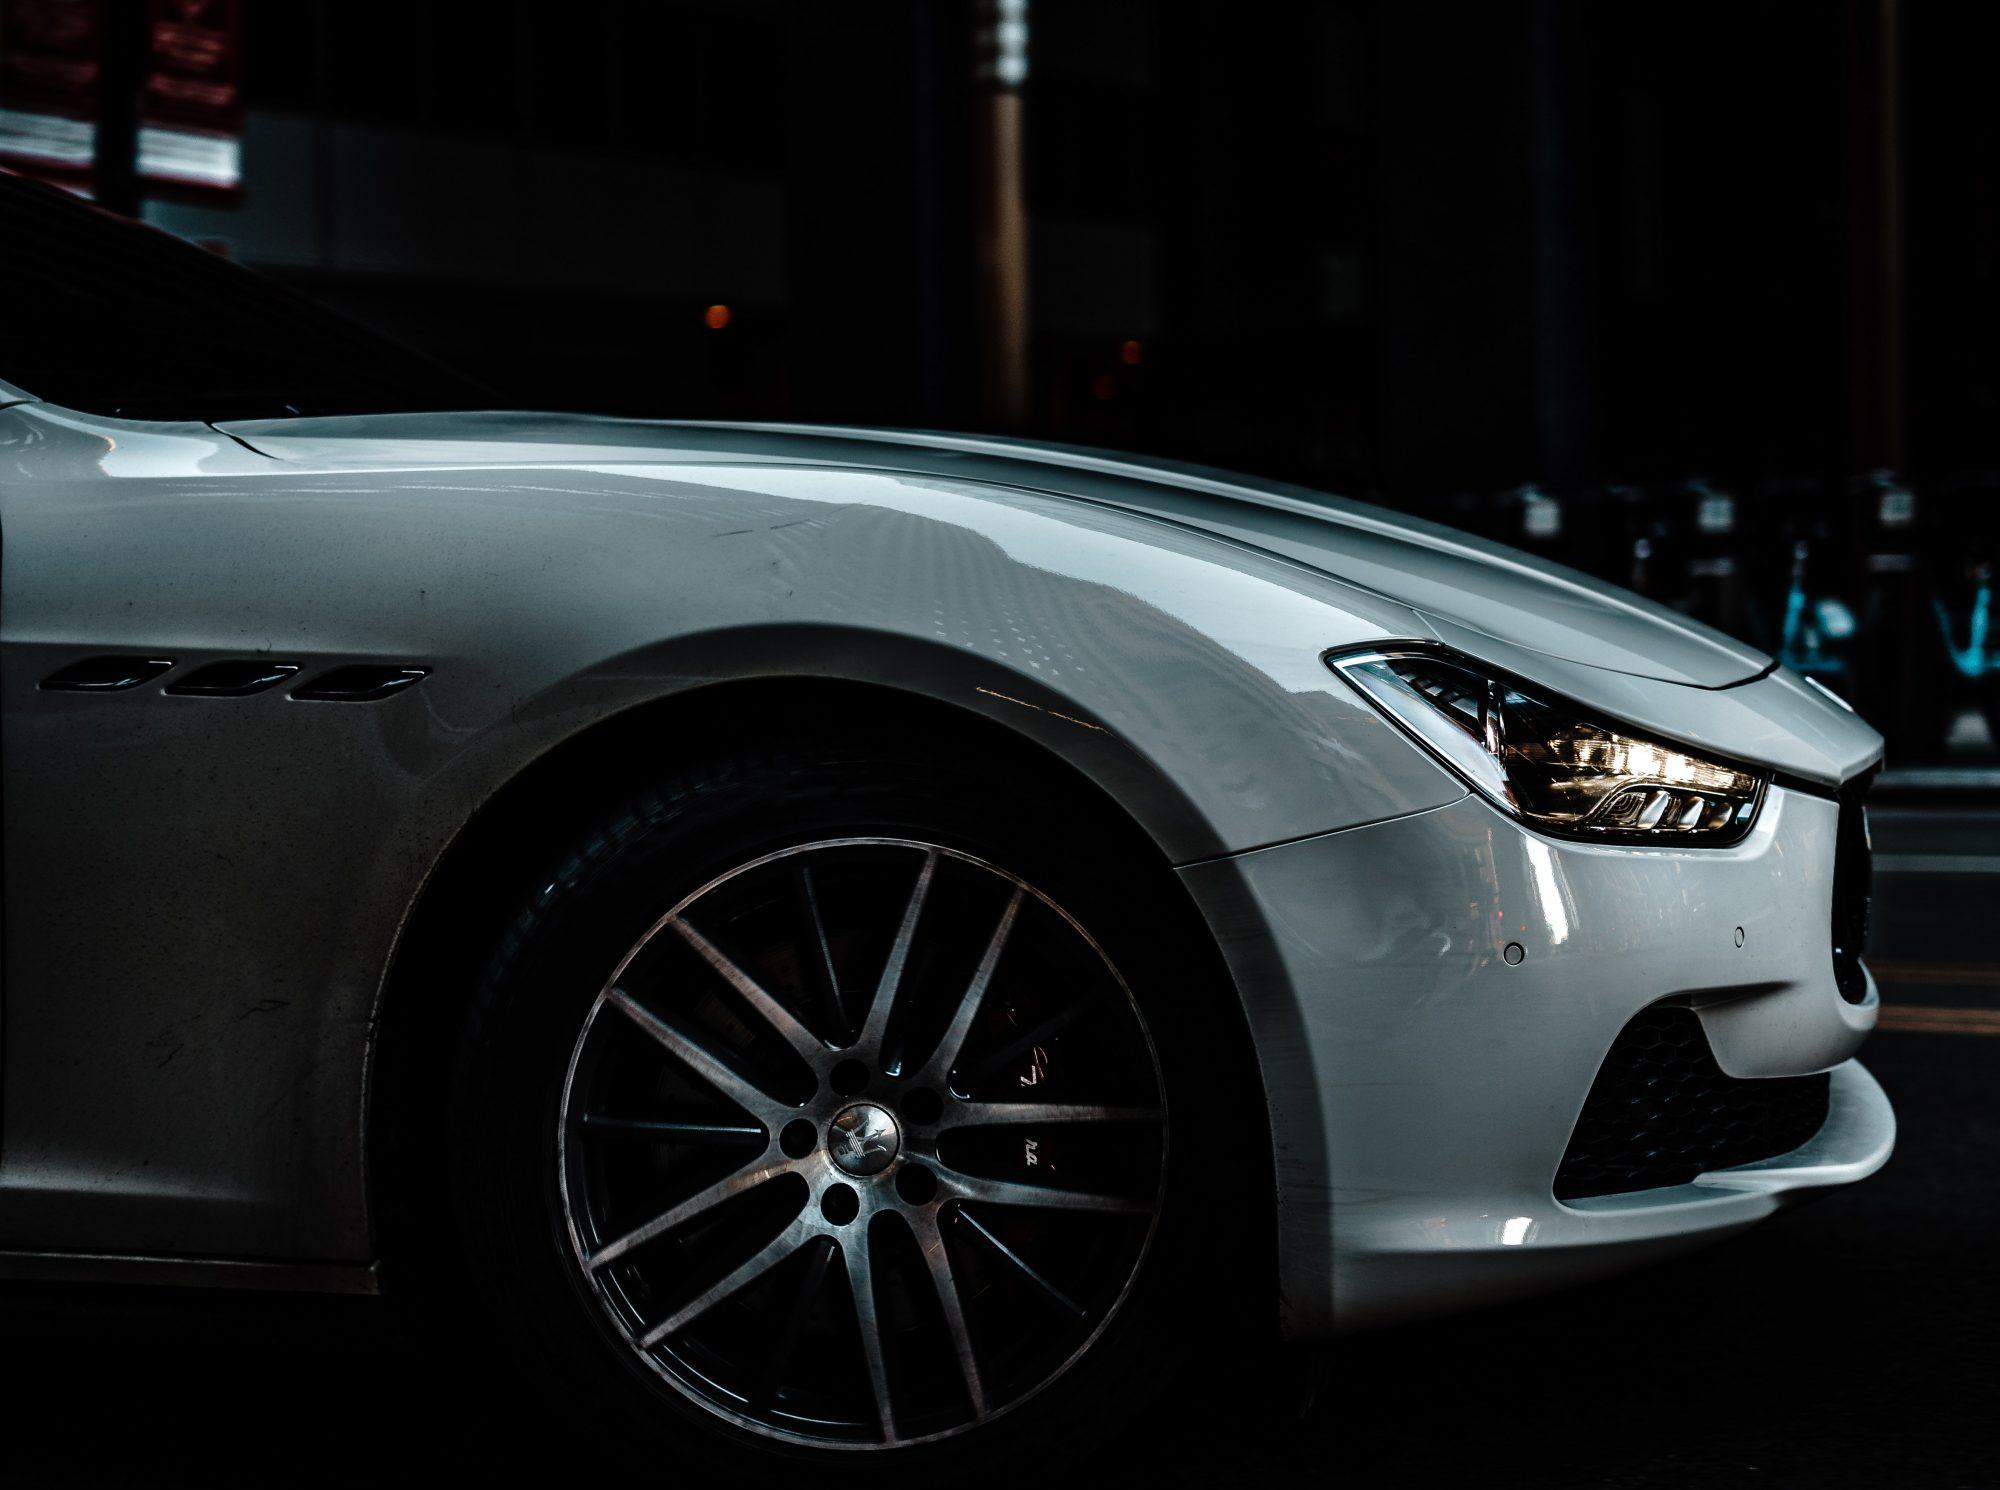 4k-wallpaper-alloy-rim-automobile-1236710